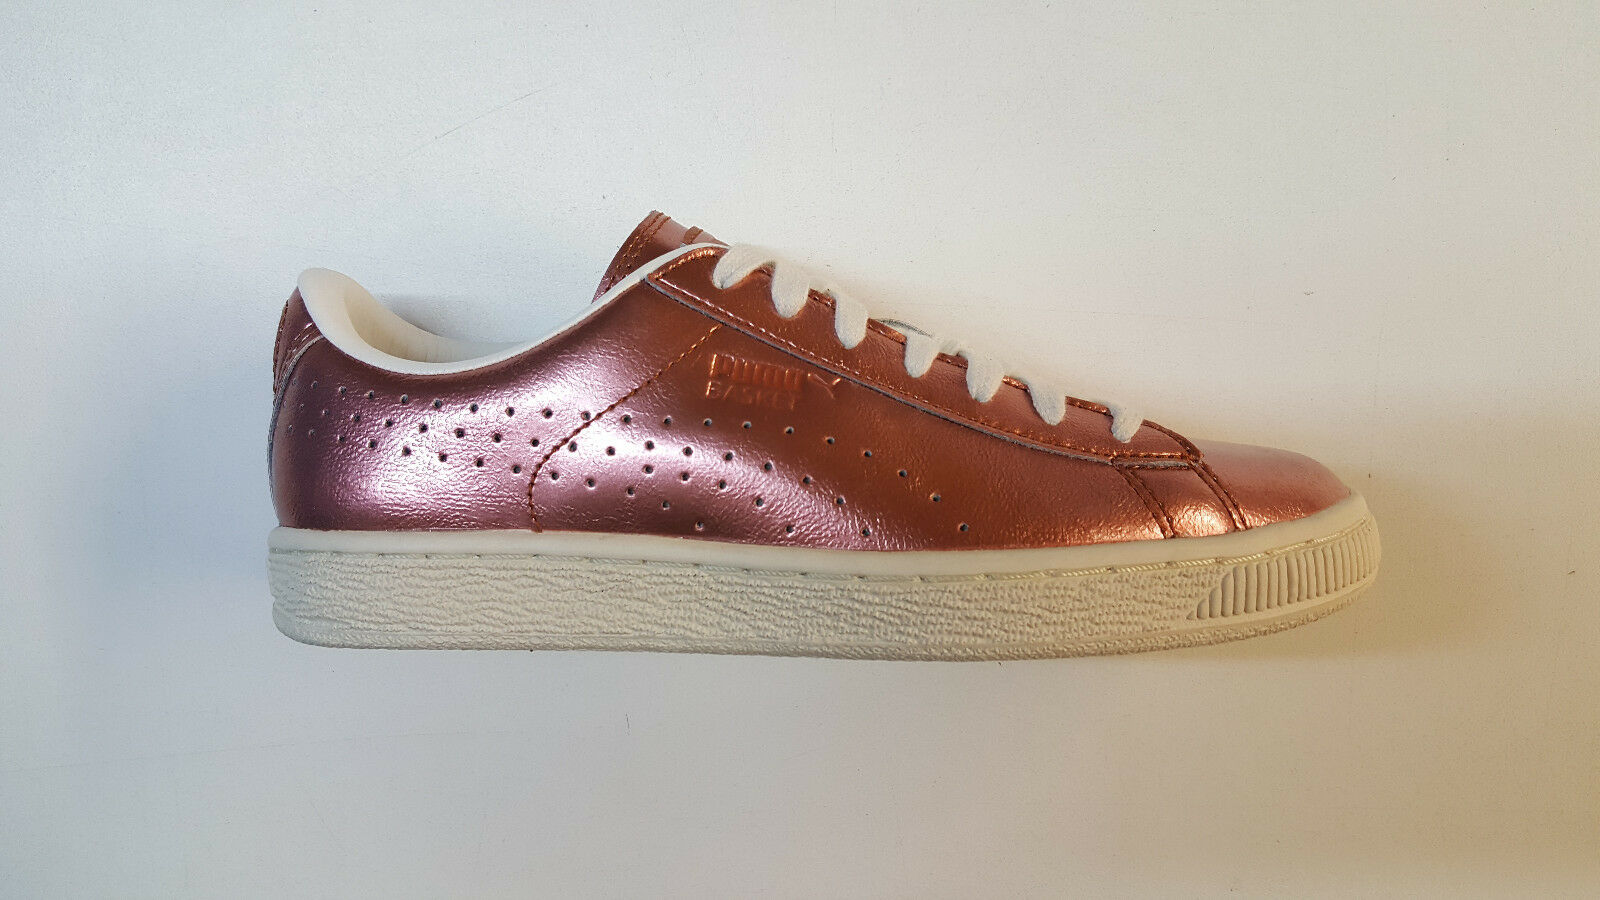 Puma Basket Citi Series Metallic Copper White Womens Sneakers 364165-01 1706-35 Brand discount